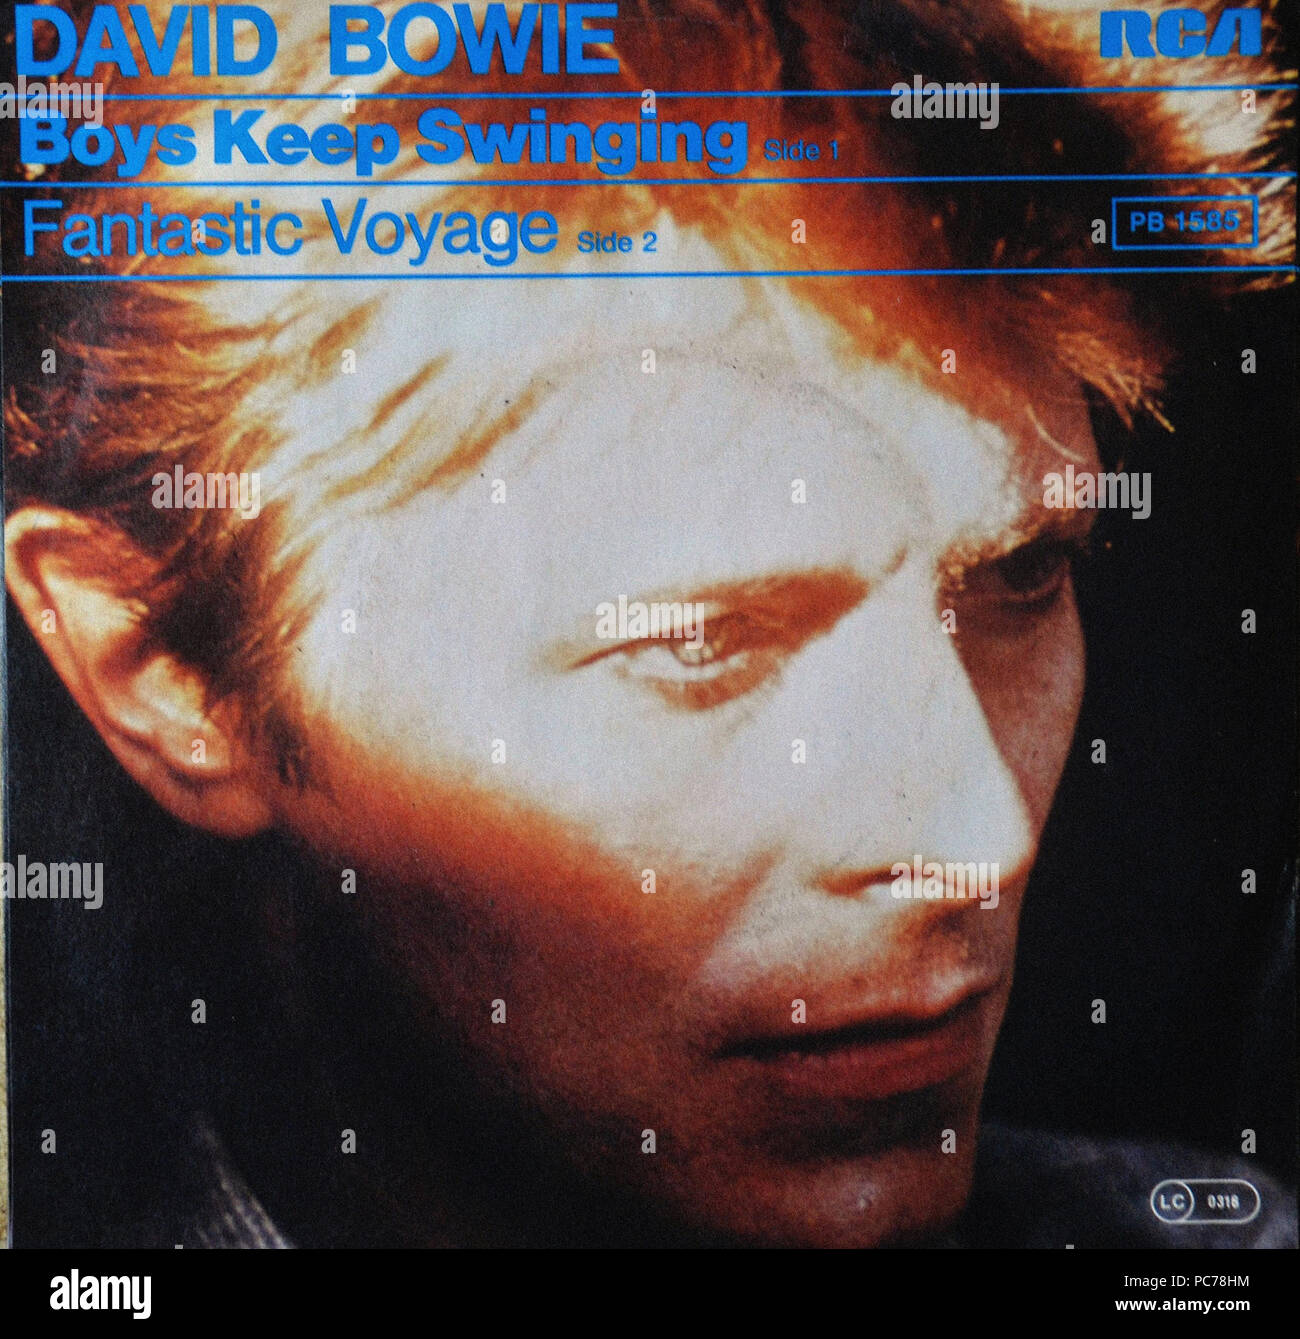 David Bowie - Vintage vinyl album cover Stock Photo: 214060720 - Alamy